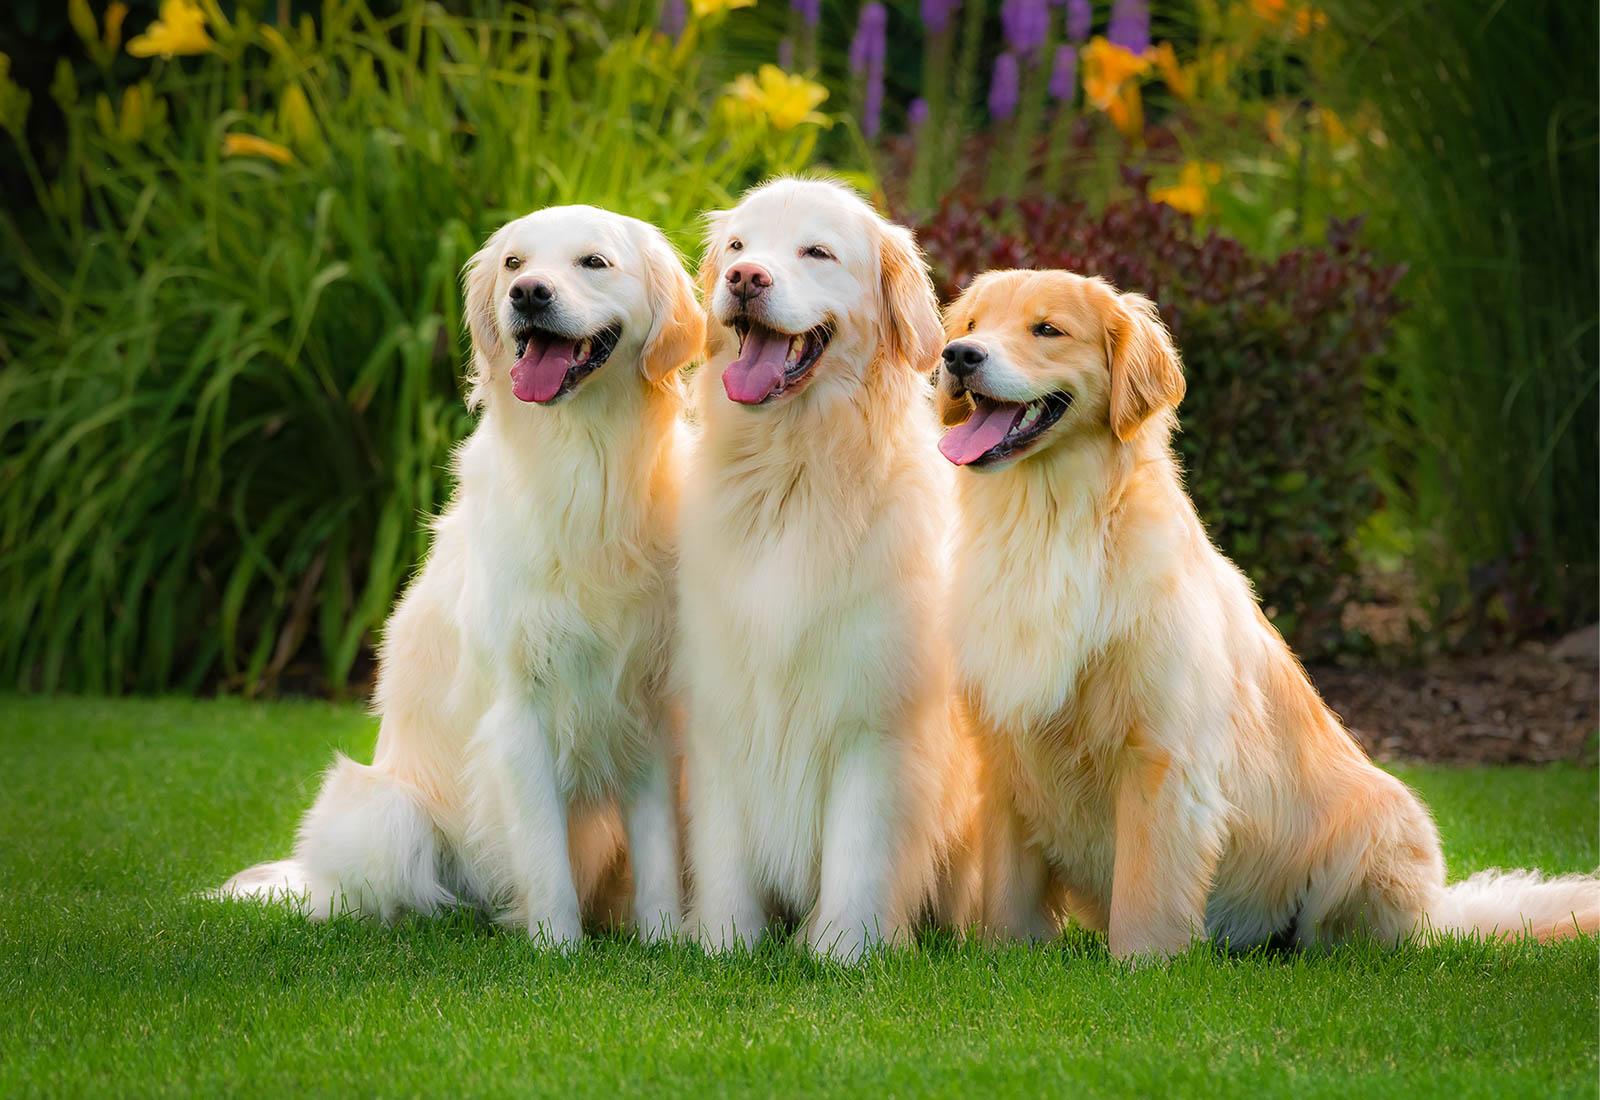 Three Golden Retrievers smiling